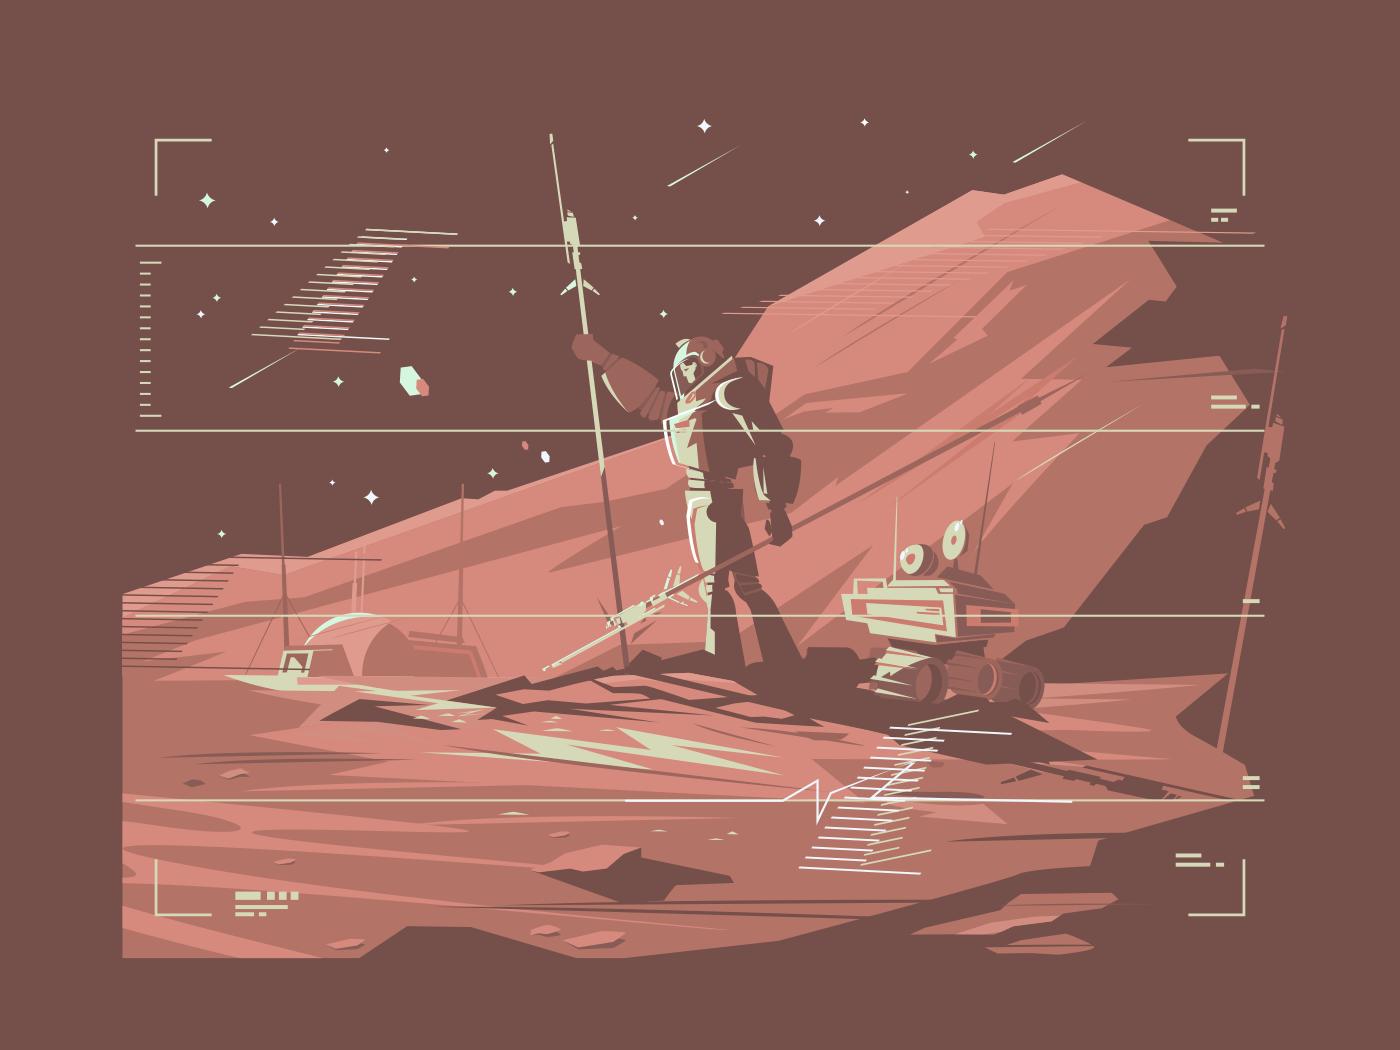 Human life on surface of planet Mars illustration